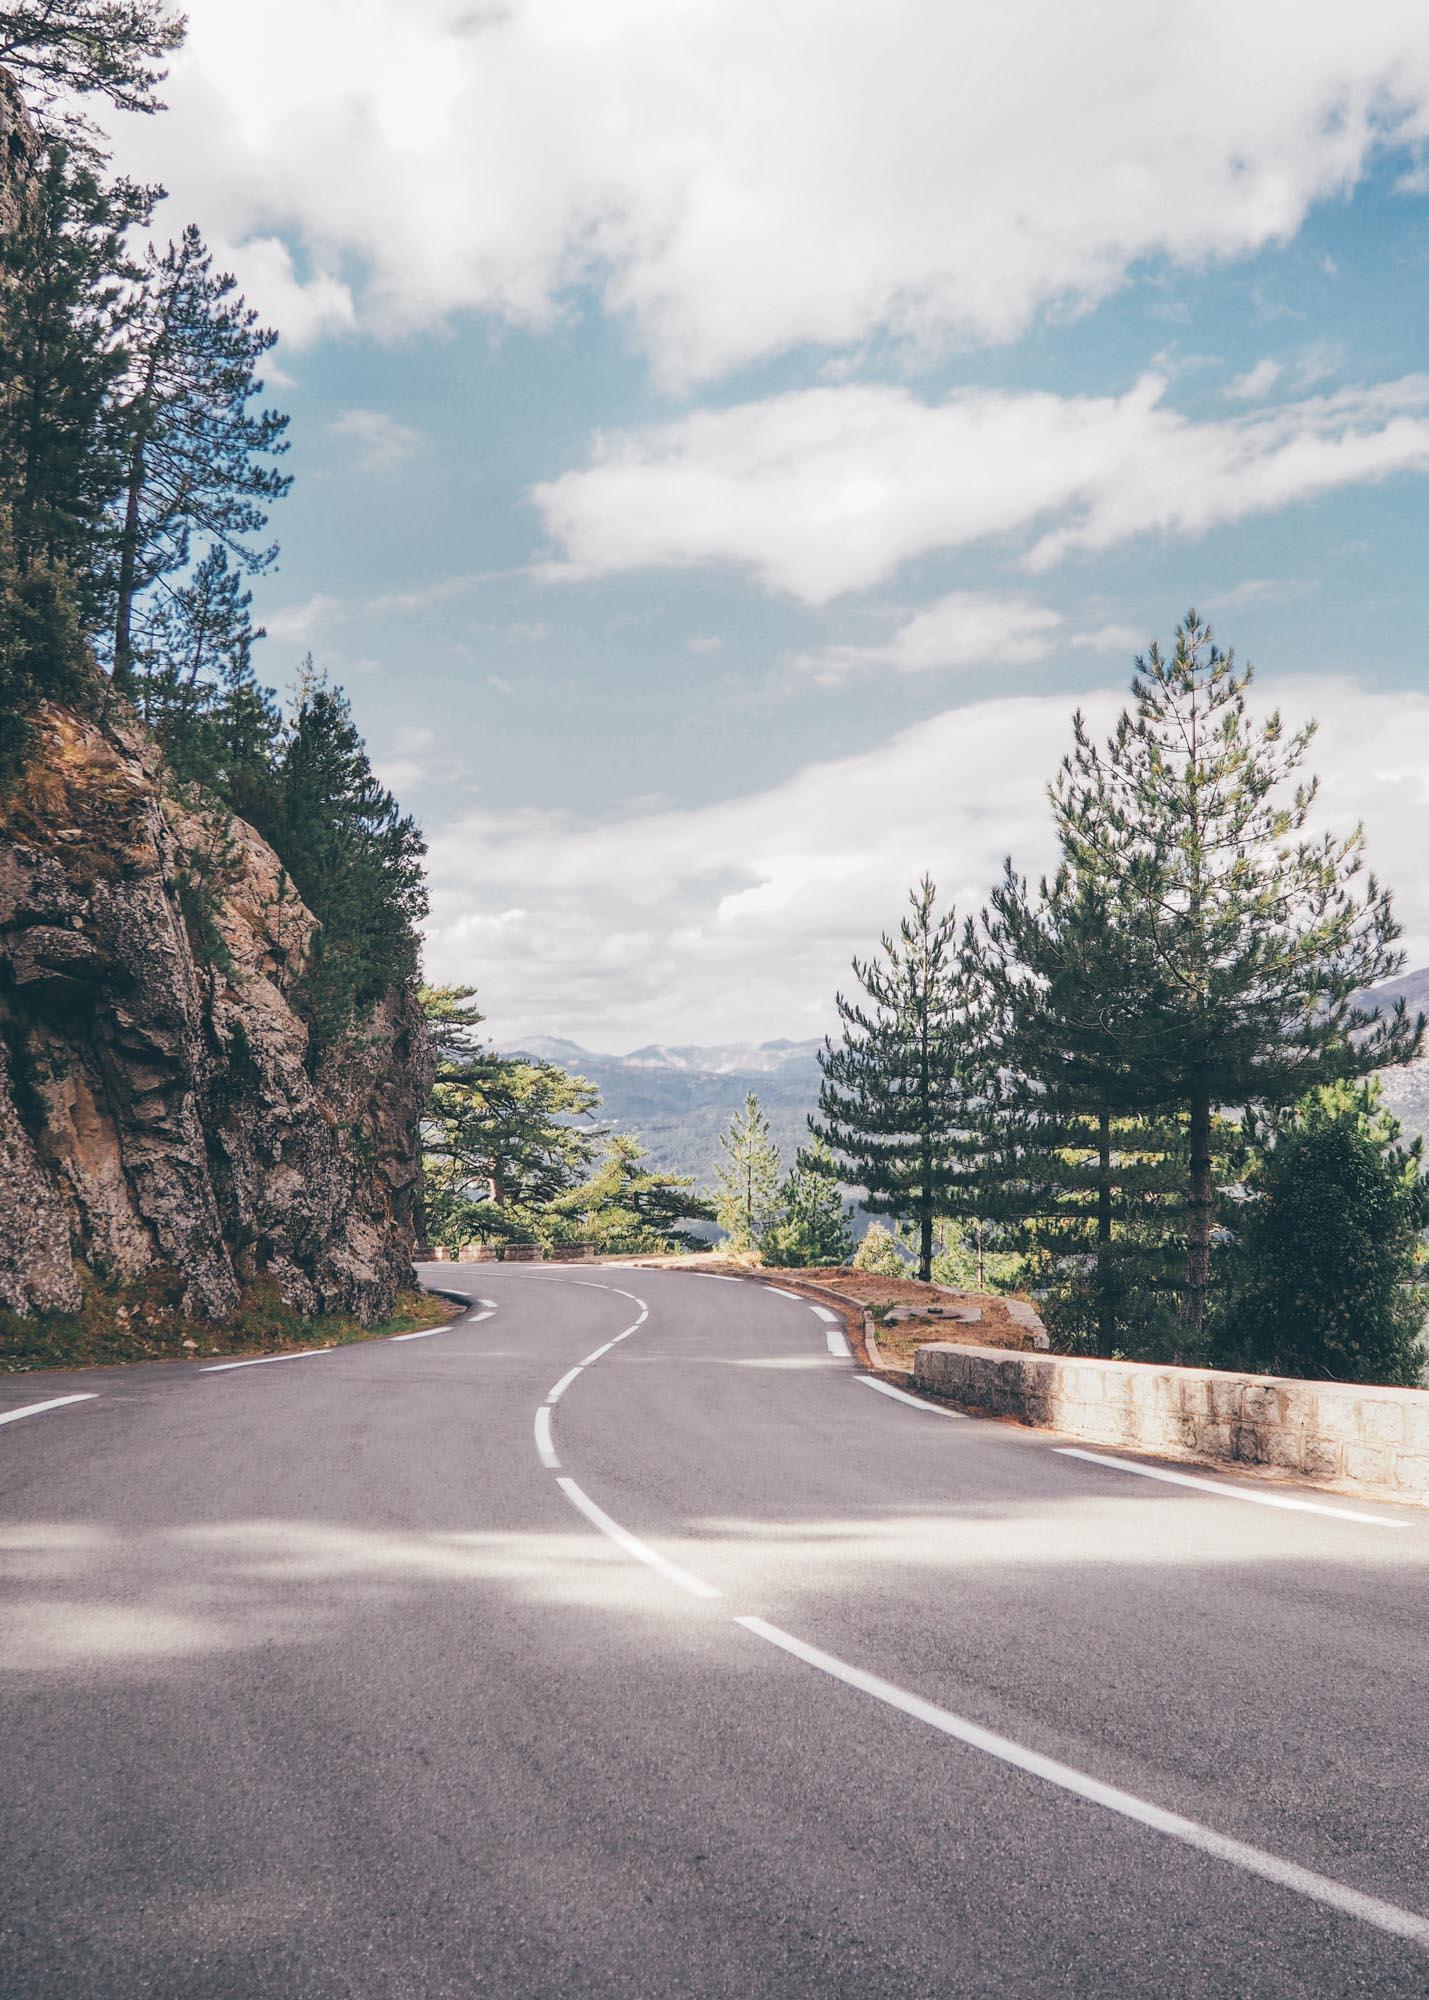 Road trip en Corse, lAlta Rocca / Tippy.fr